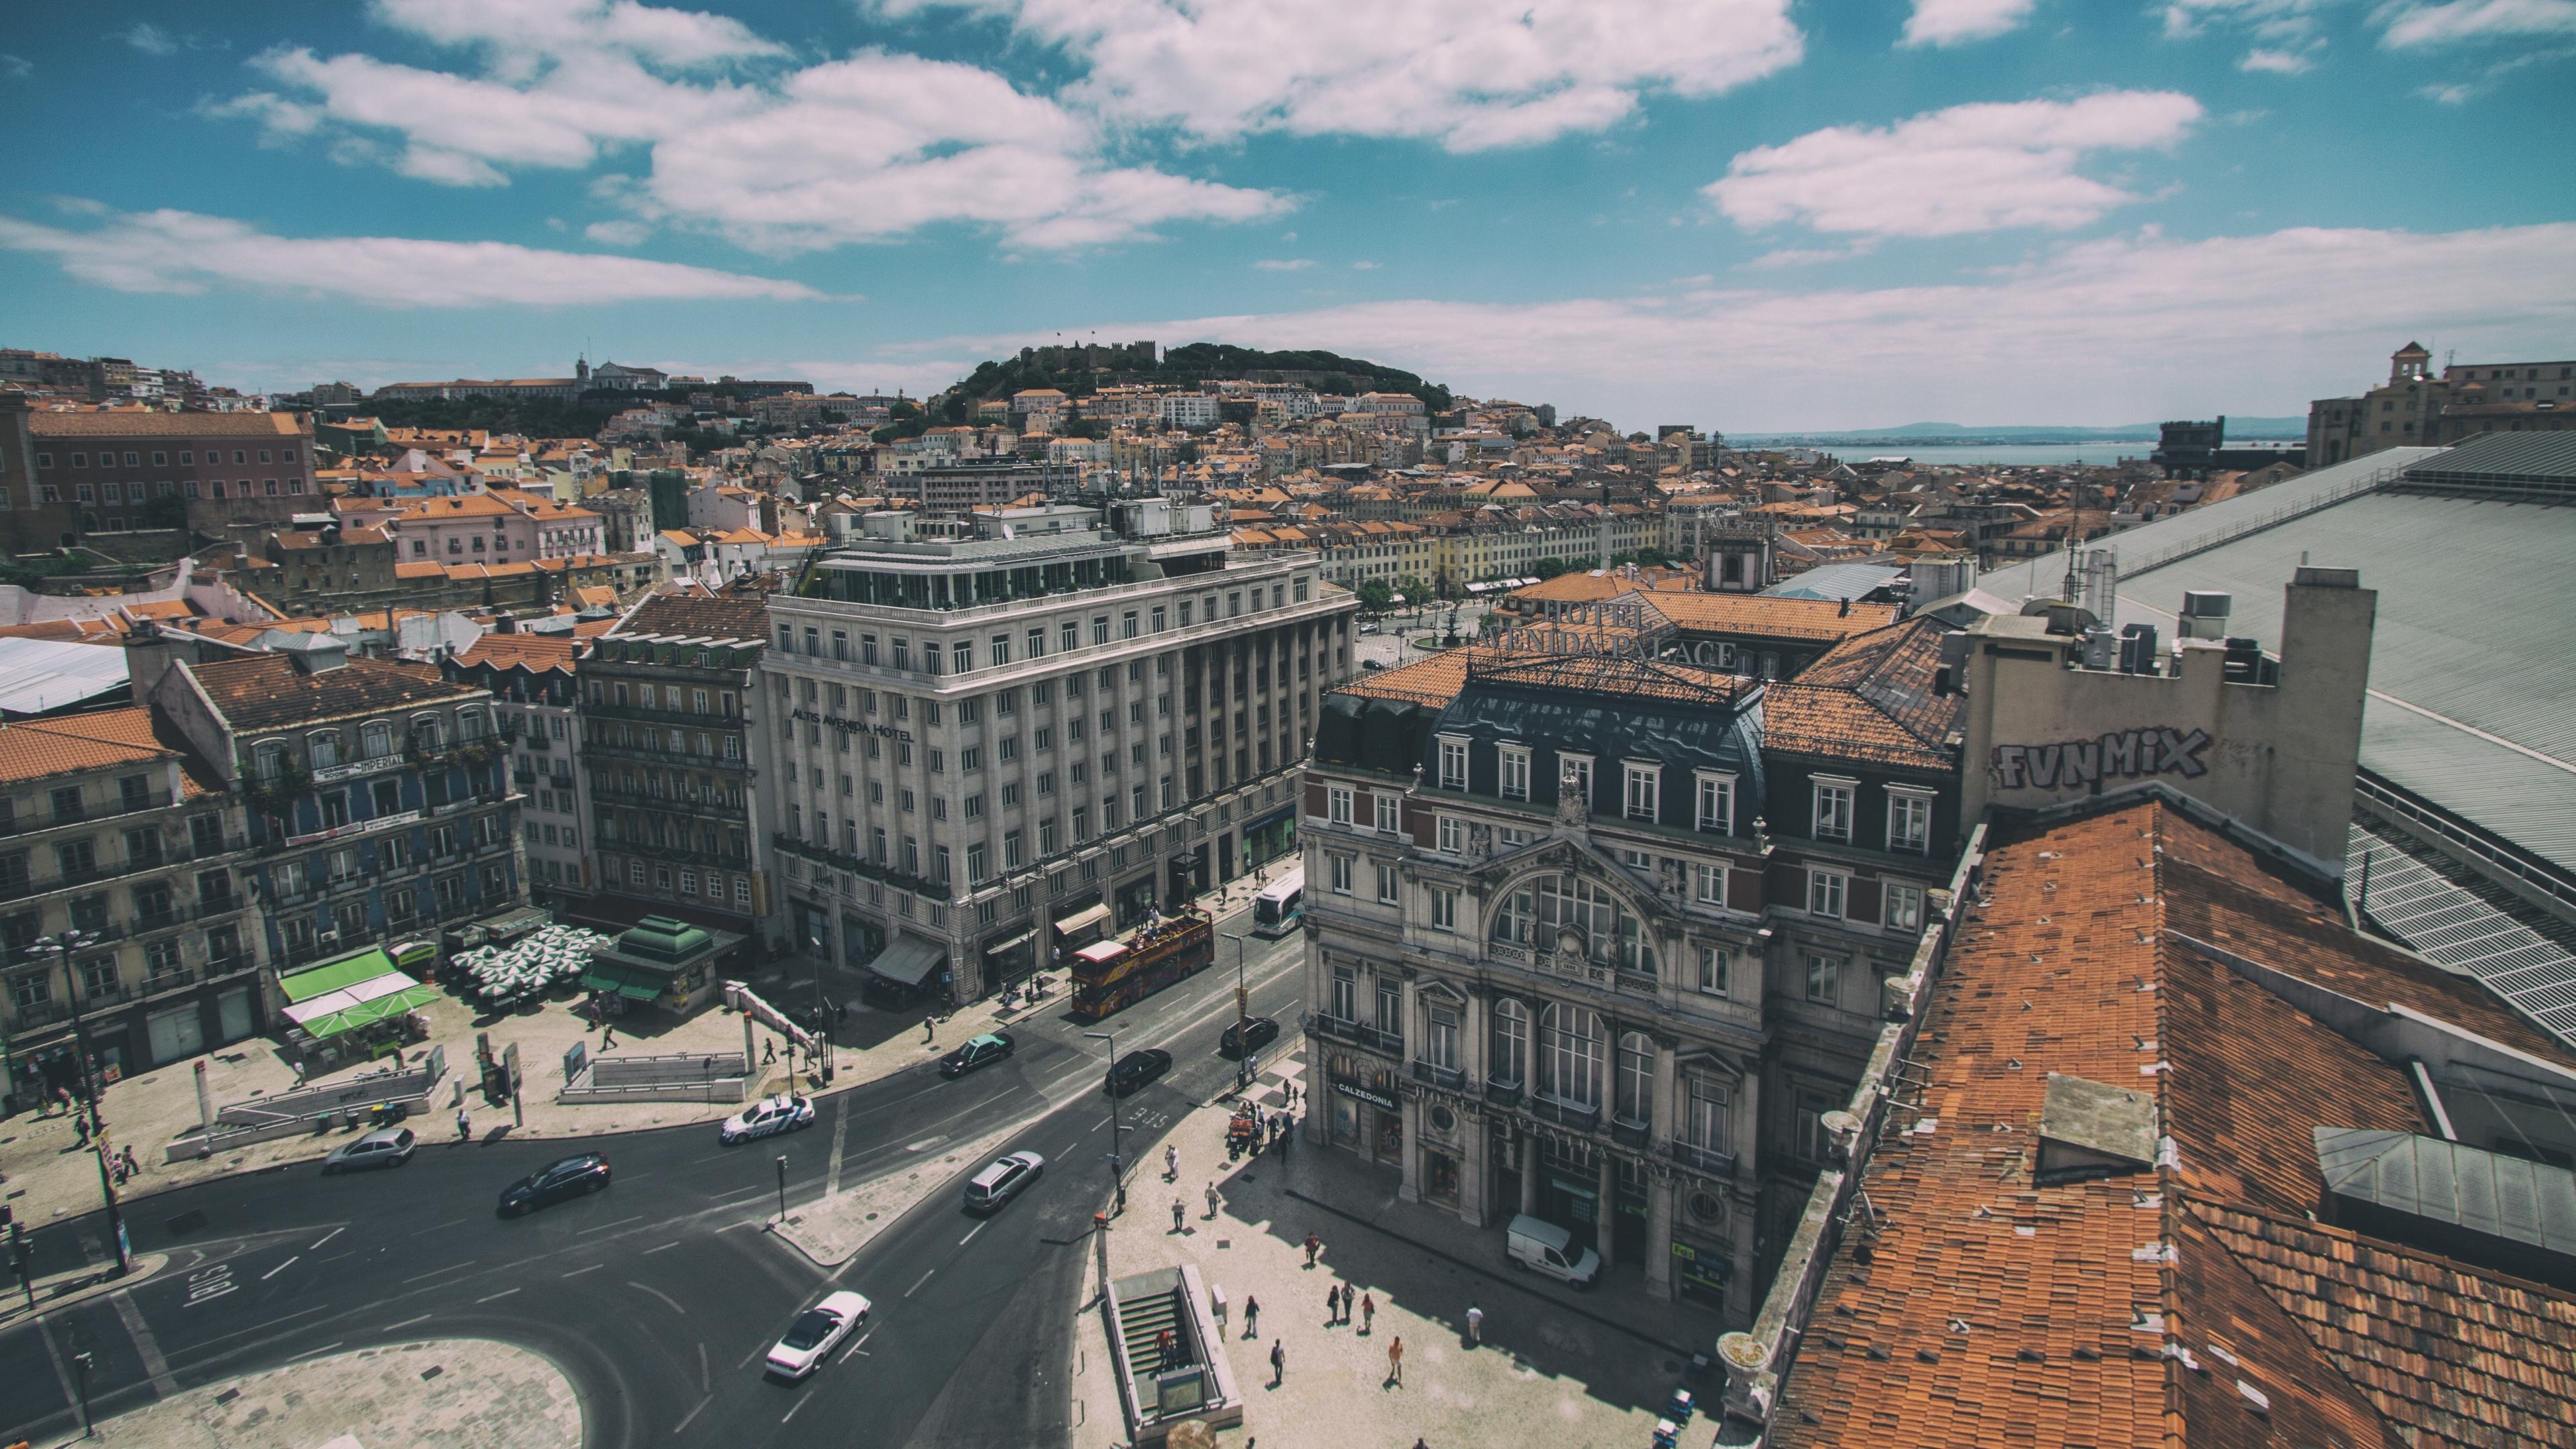 lisbon portugal buildings view from above 4k 1538065659 - lisbon, portugal, buildings, view from above 4k - Portugal, Lisbon, buildings